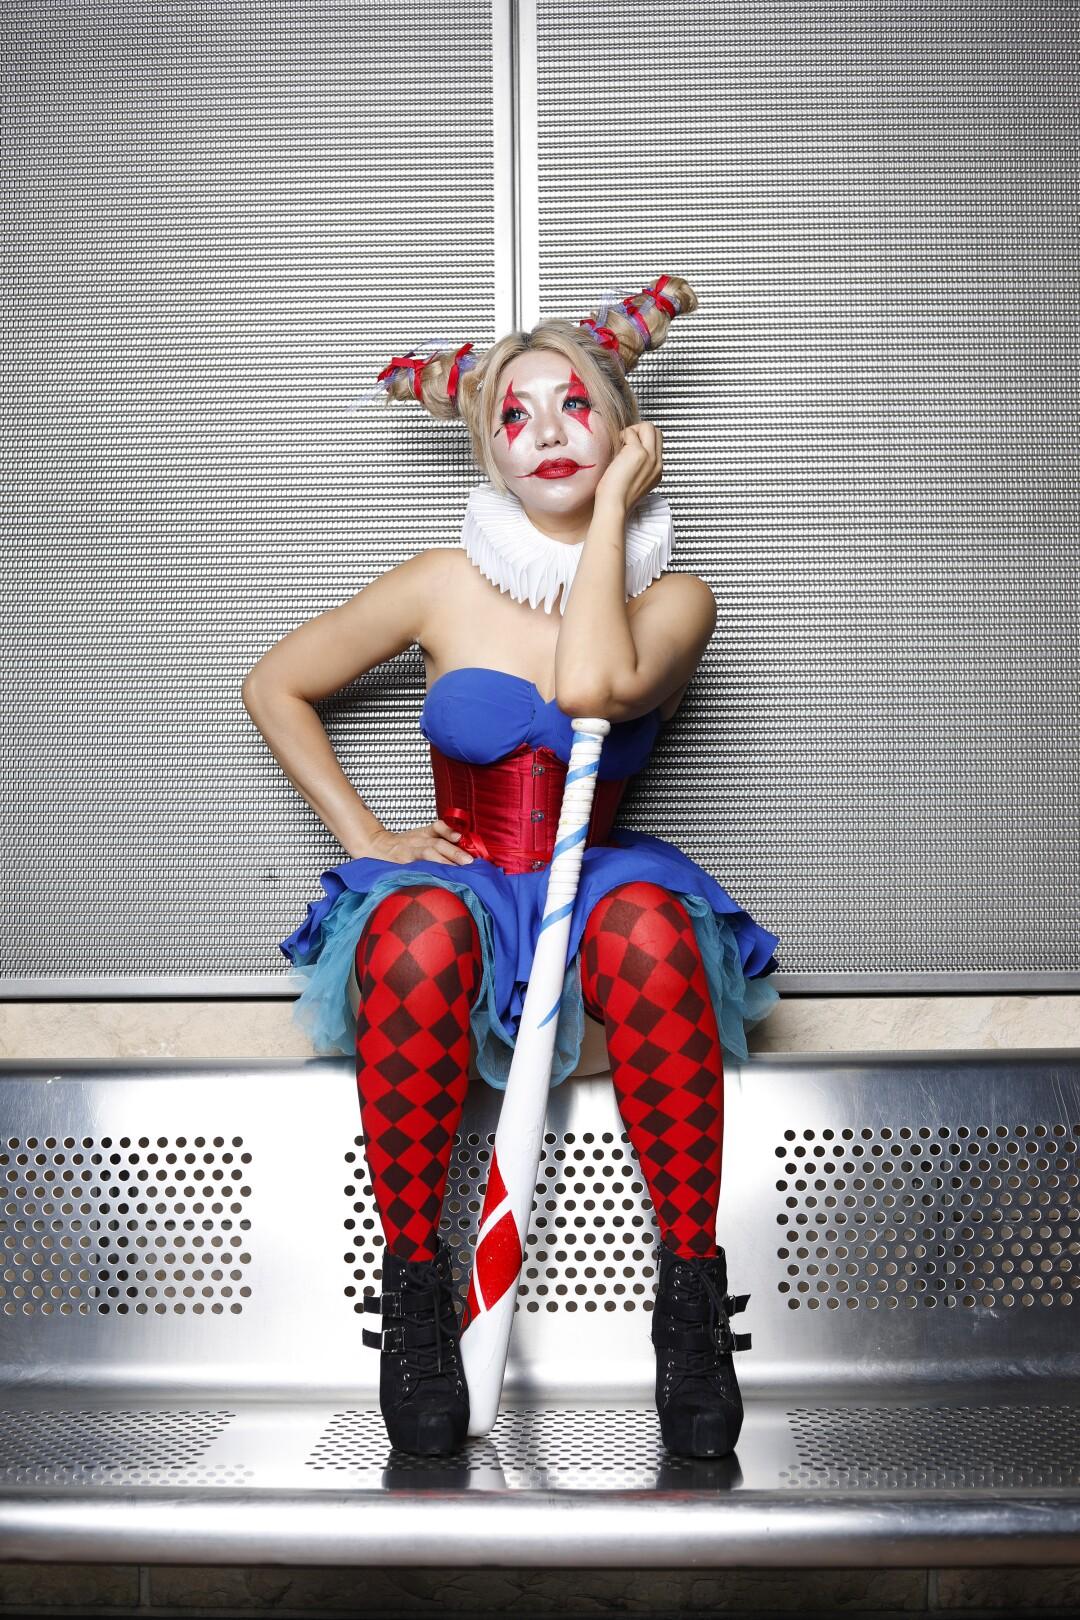 Tita Ghanjanasak dressed as Harley Quinn